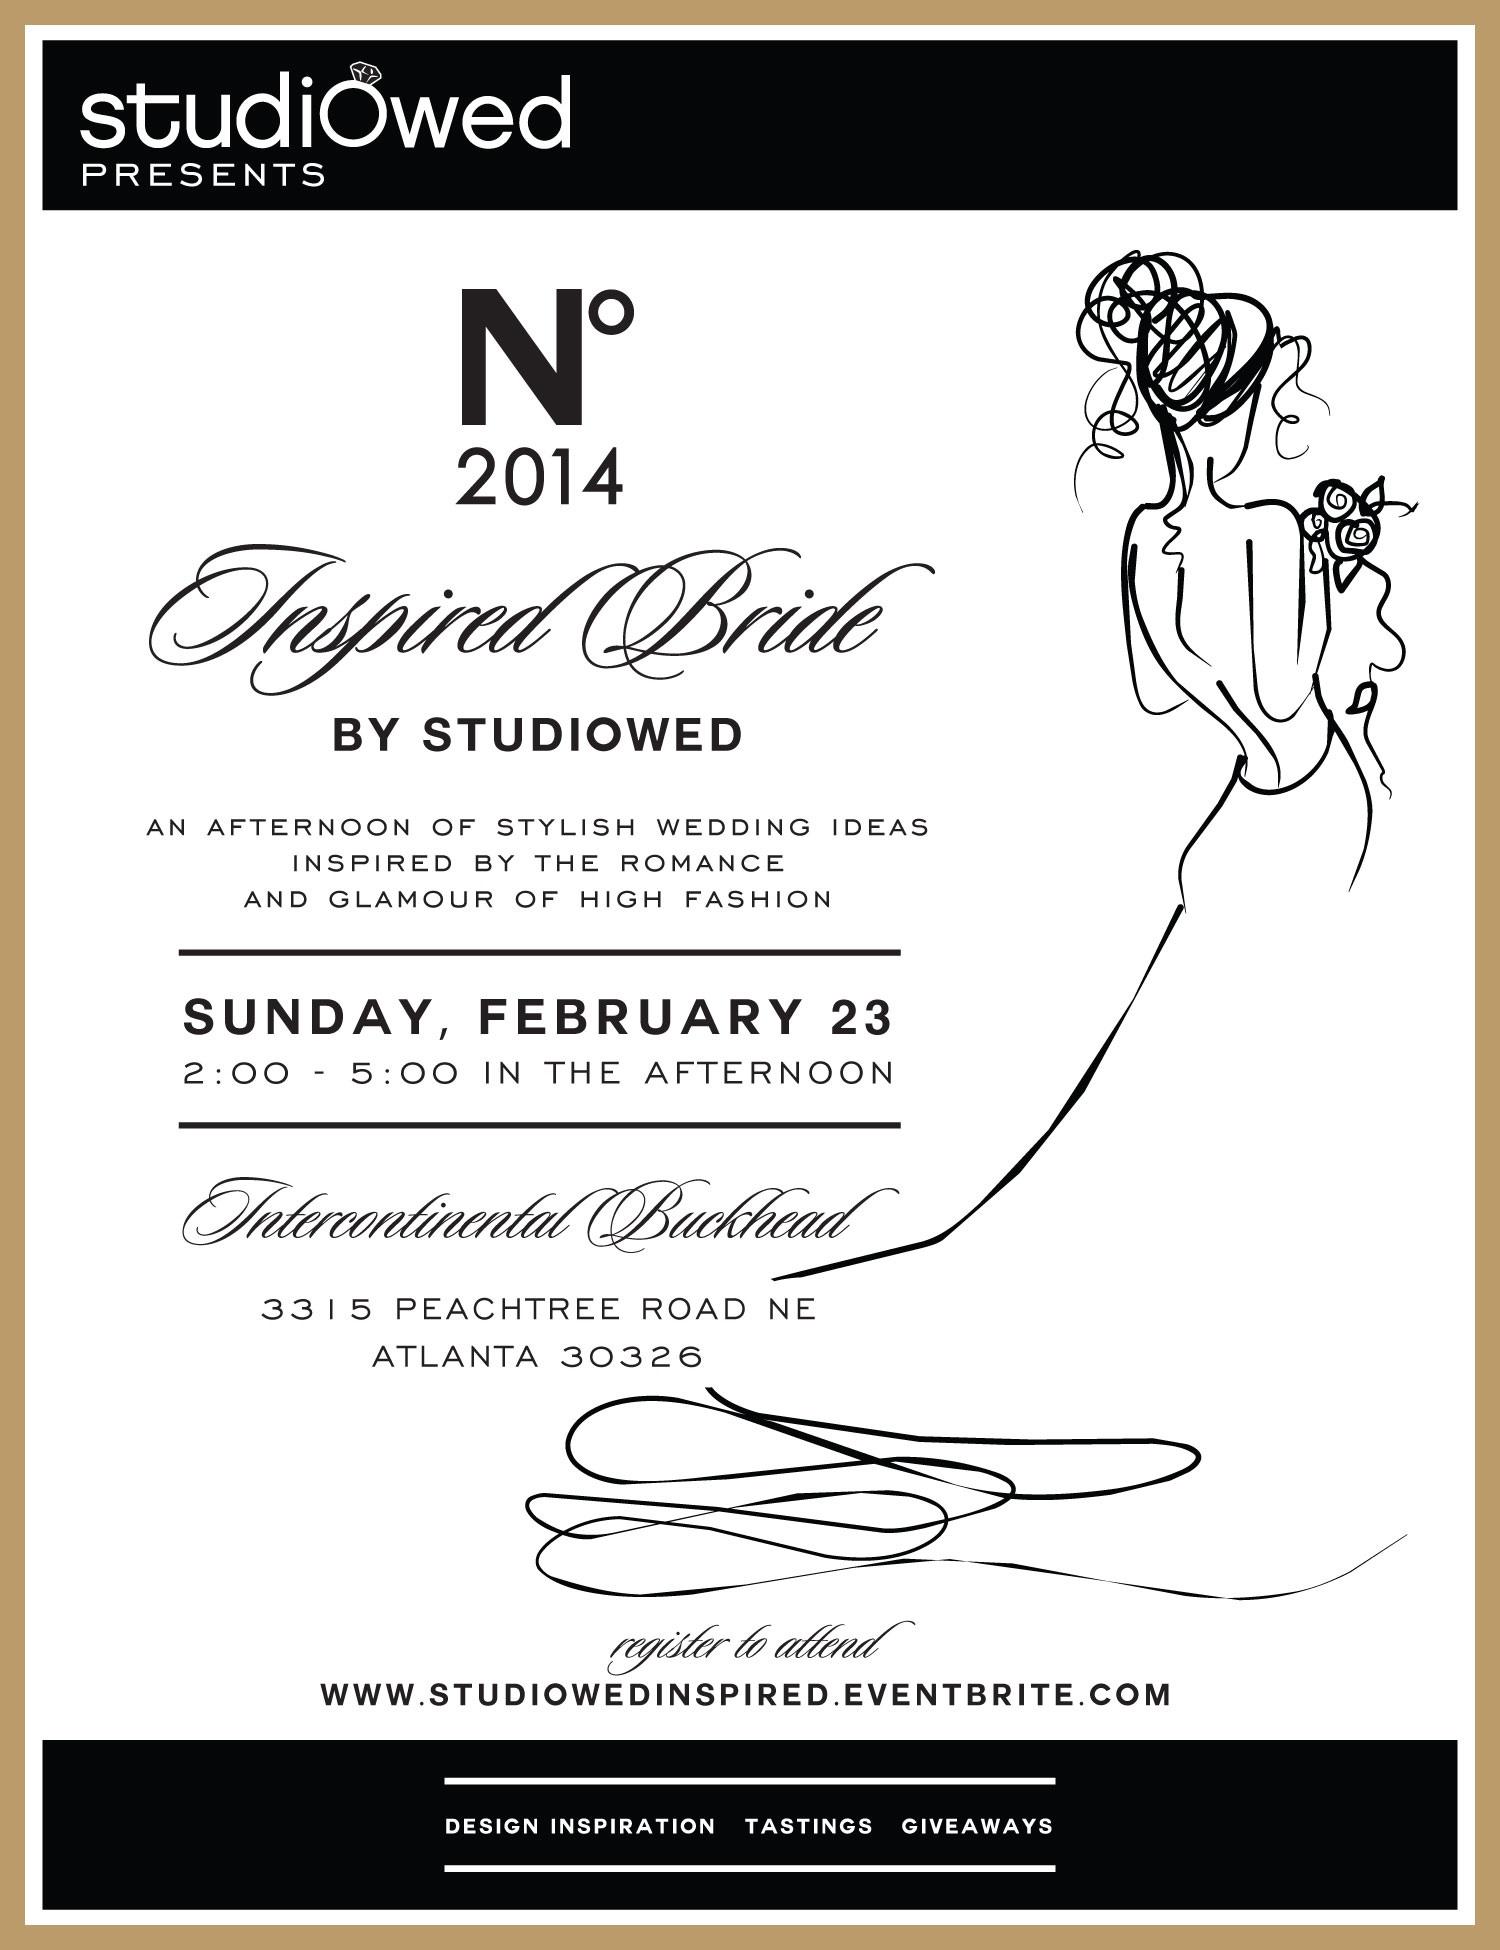 StudioWed Inspired Bride 2014